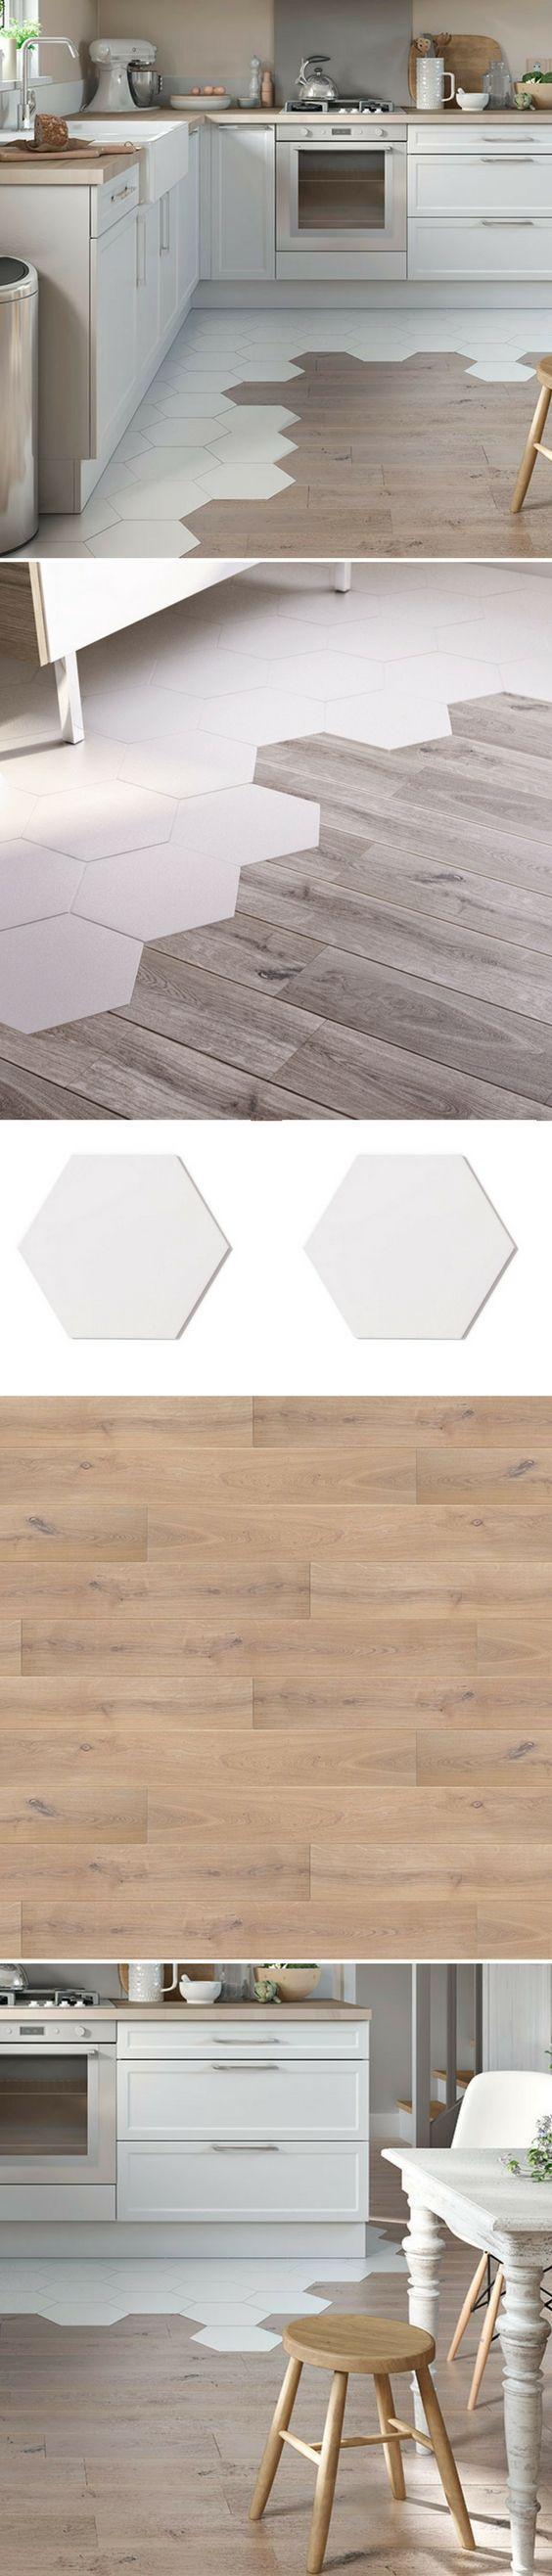 Home Design-Ideen: Home Decorating Ideas Kitchen Home Decorating Ideas Kitchen K … #WoodWorking